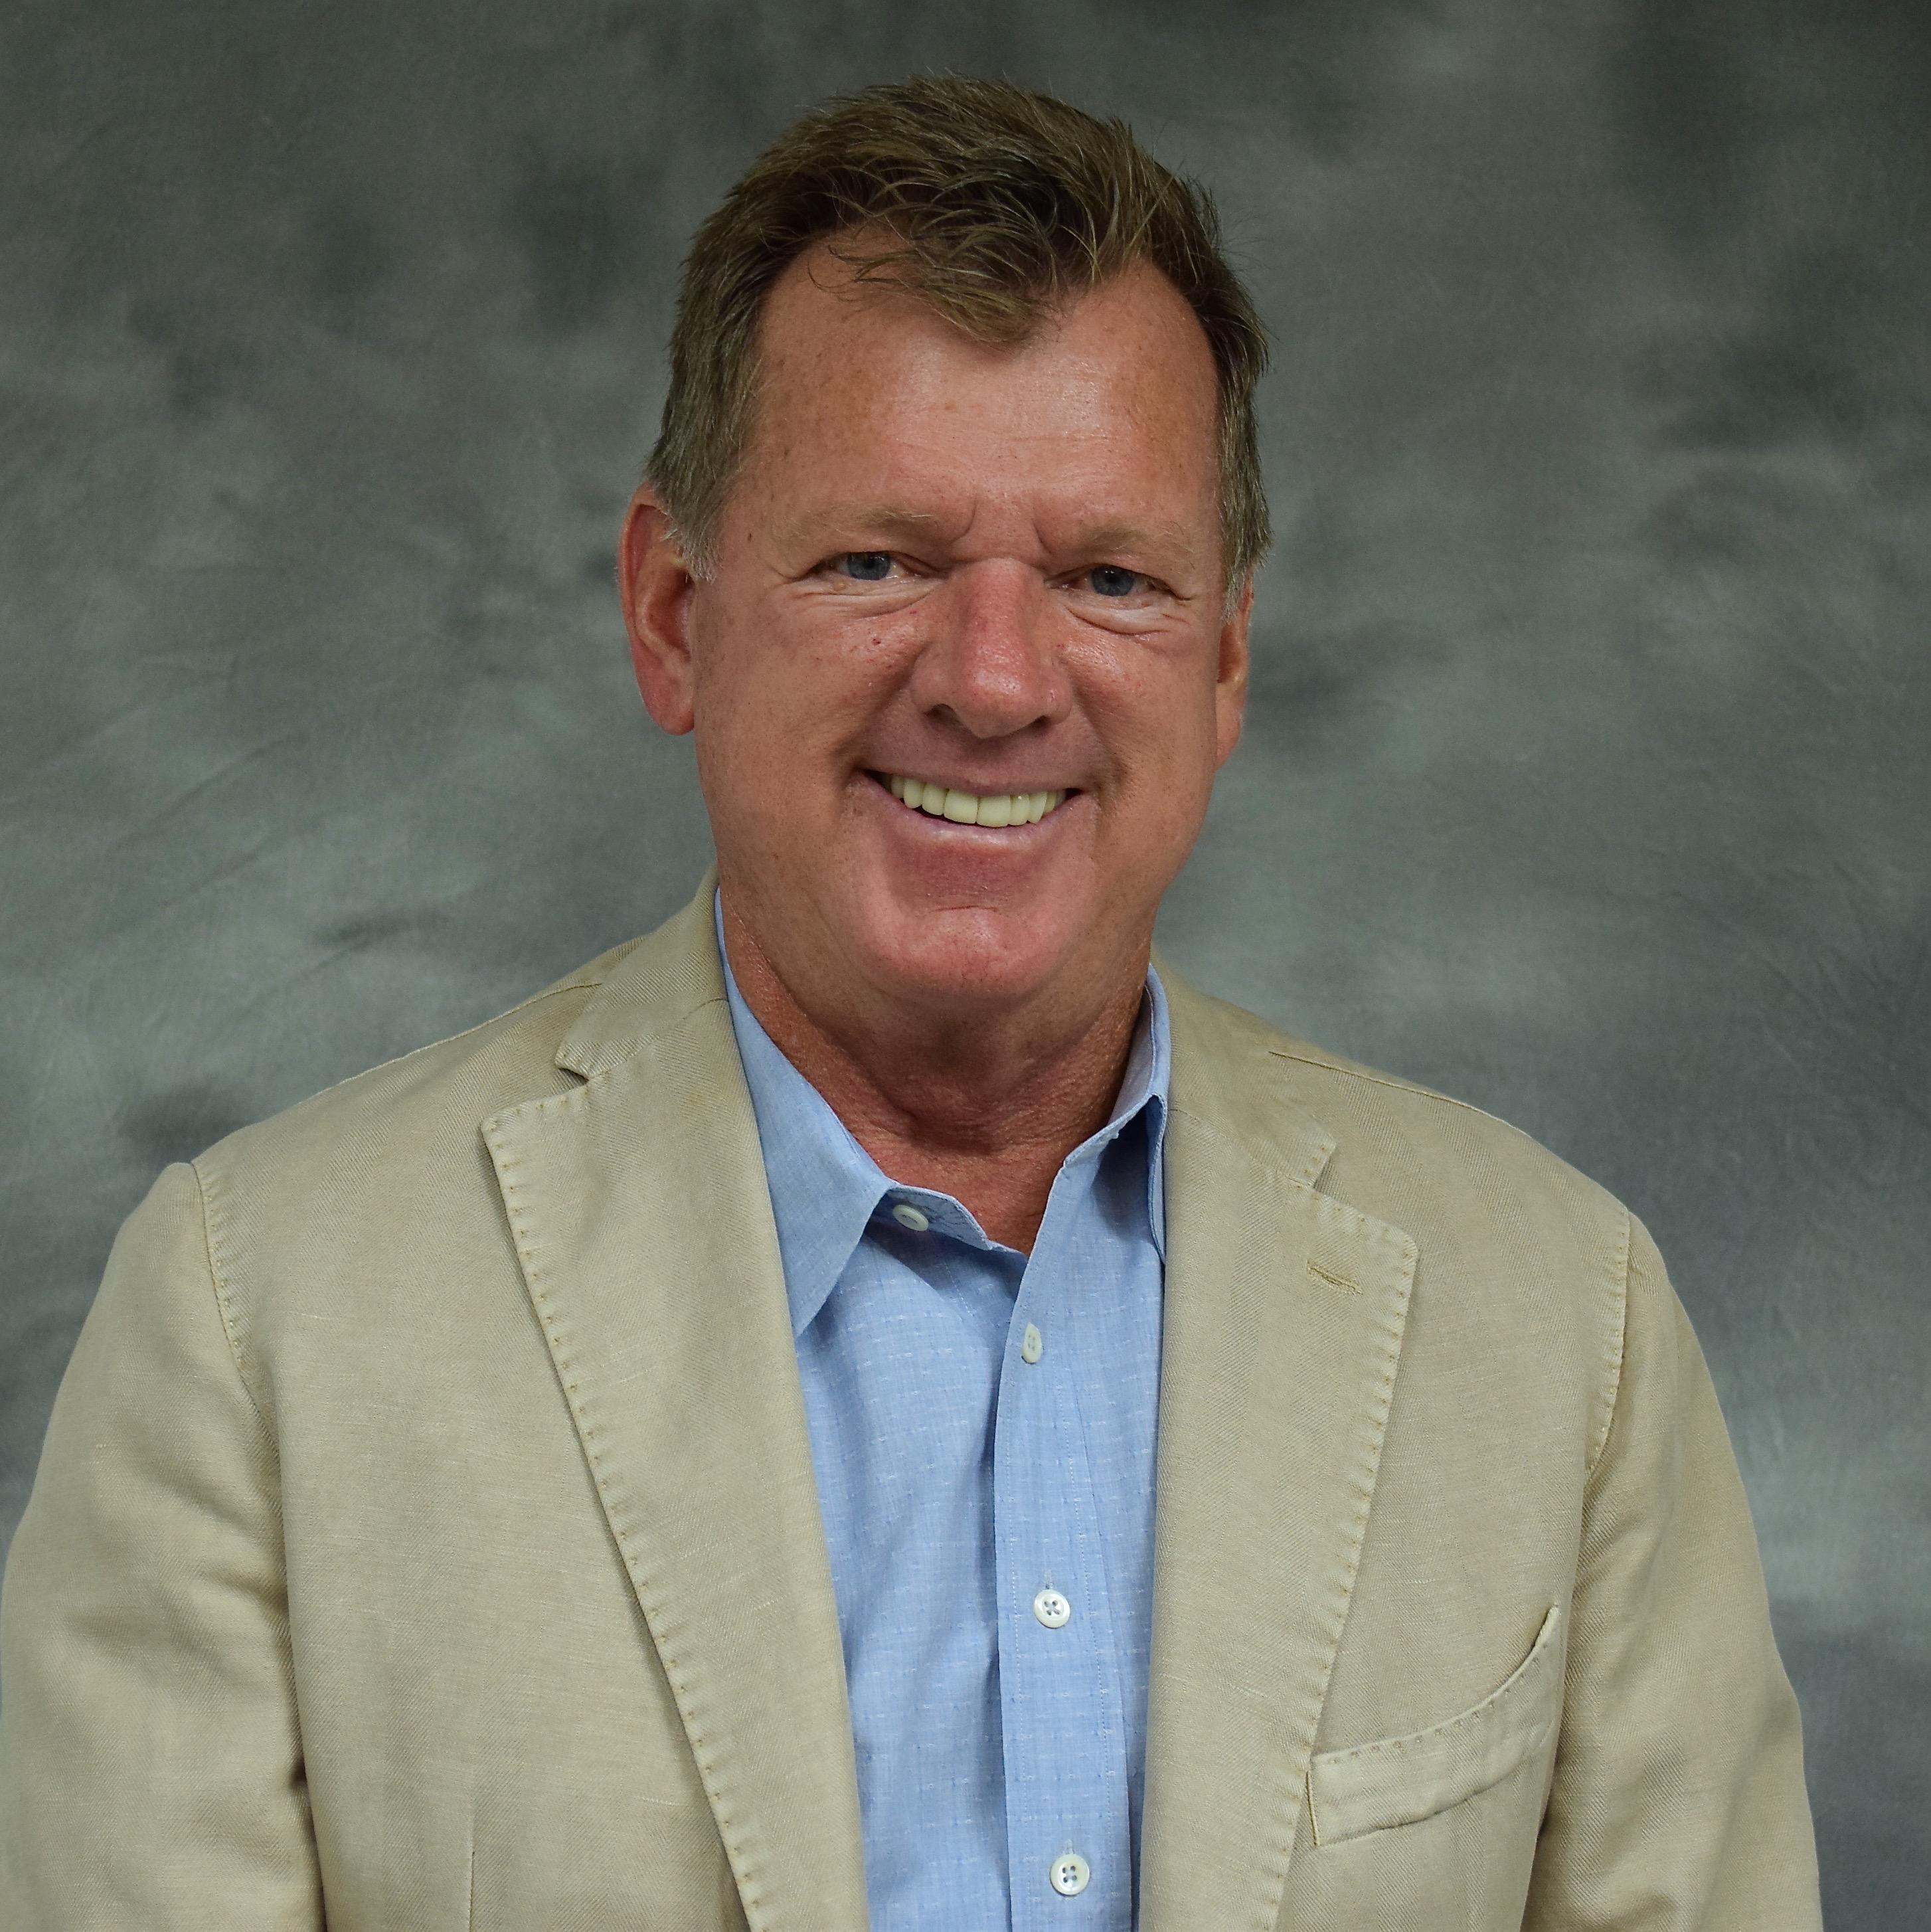 Randy Curnow